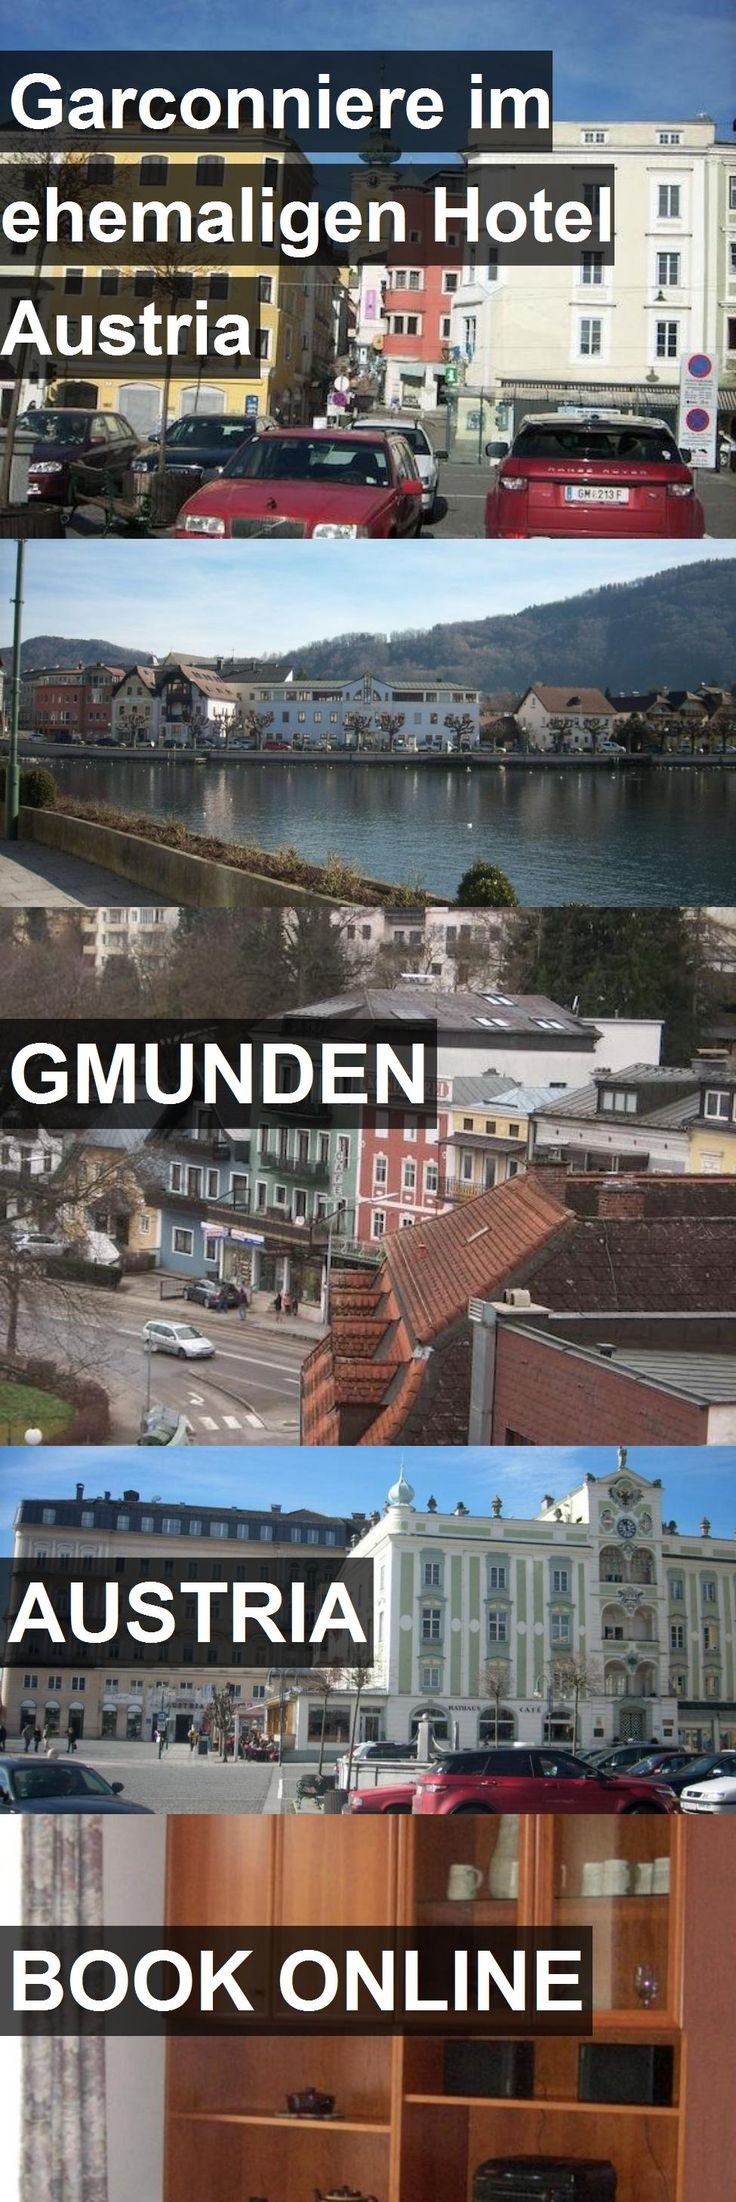 Garconniere im ehemaligen Hotel Austria in Gmunden, Austria. For more information, photos, reviews and best prices please follow the link. #Austria #Gmunden #travel #vacation #hotel